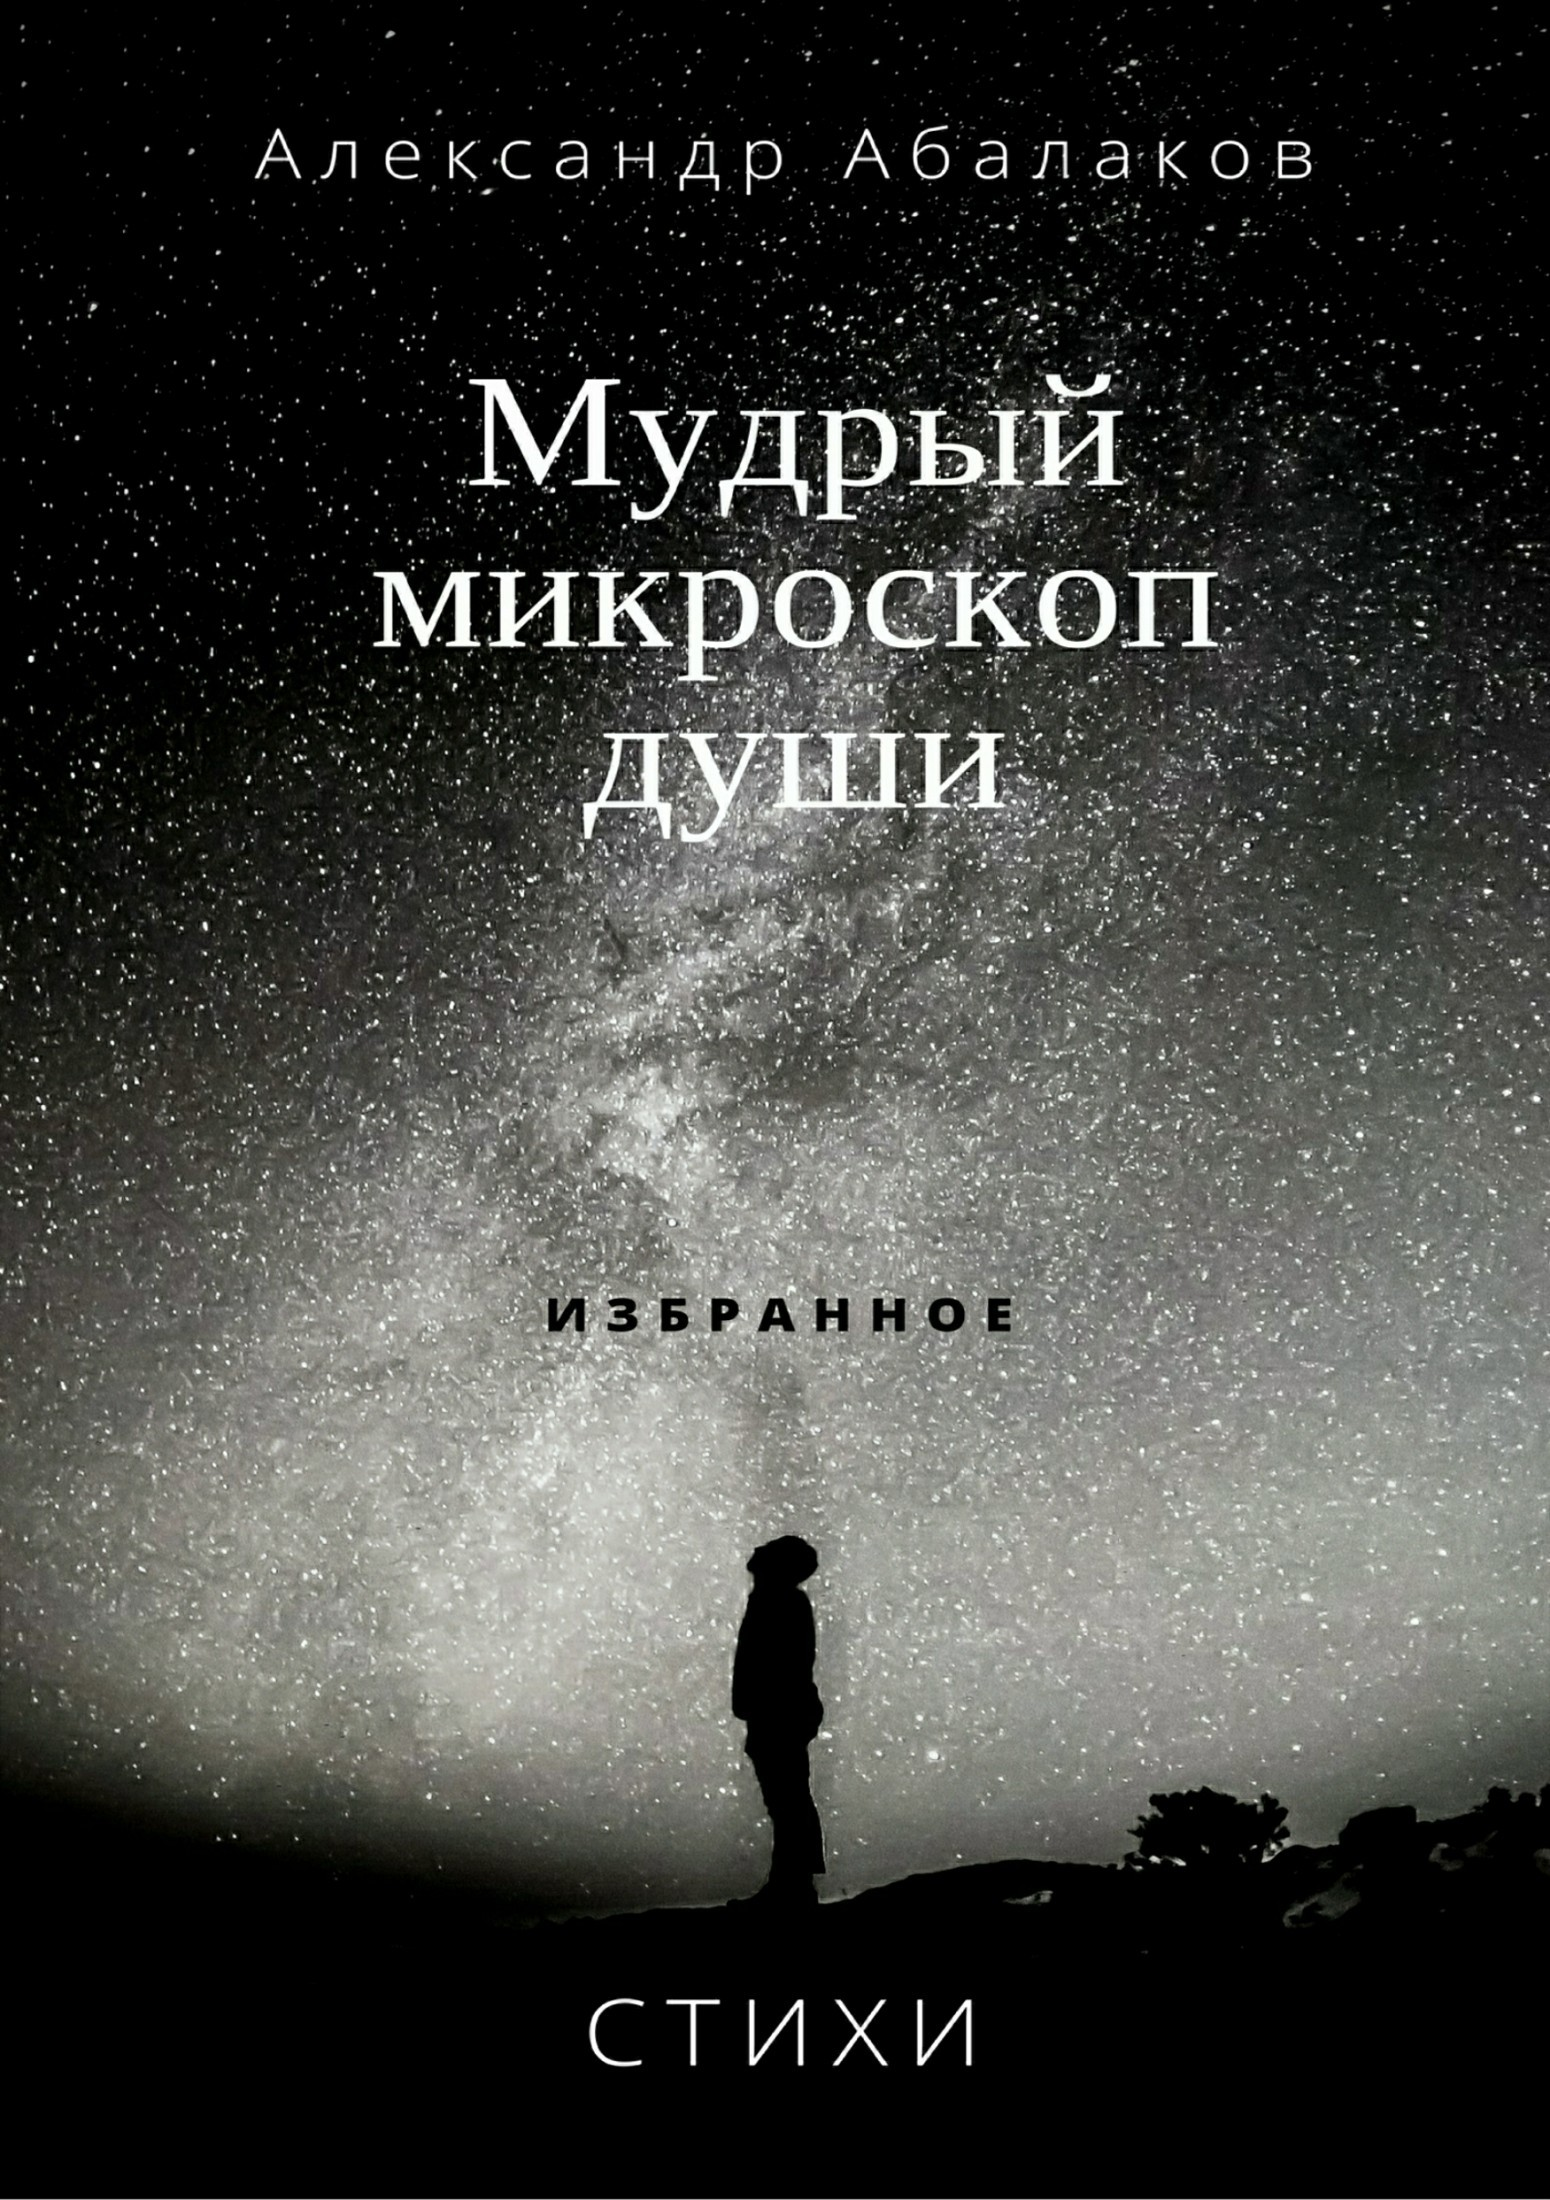 Книга Мудрый микроскоп души. Сборник стихотворений